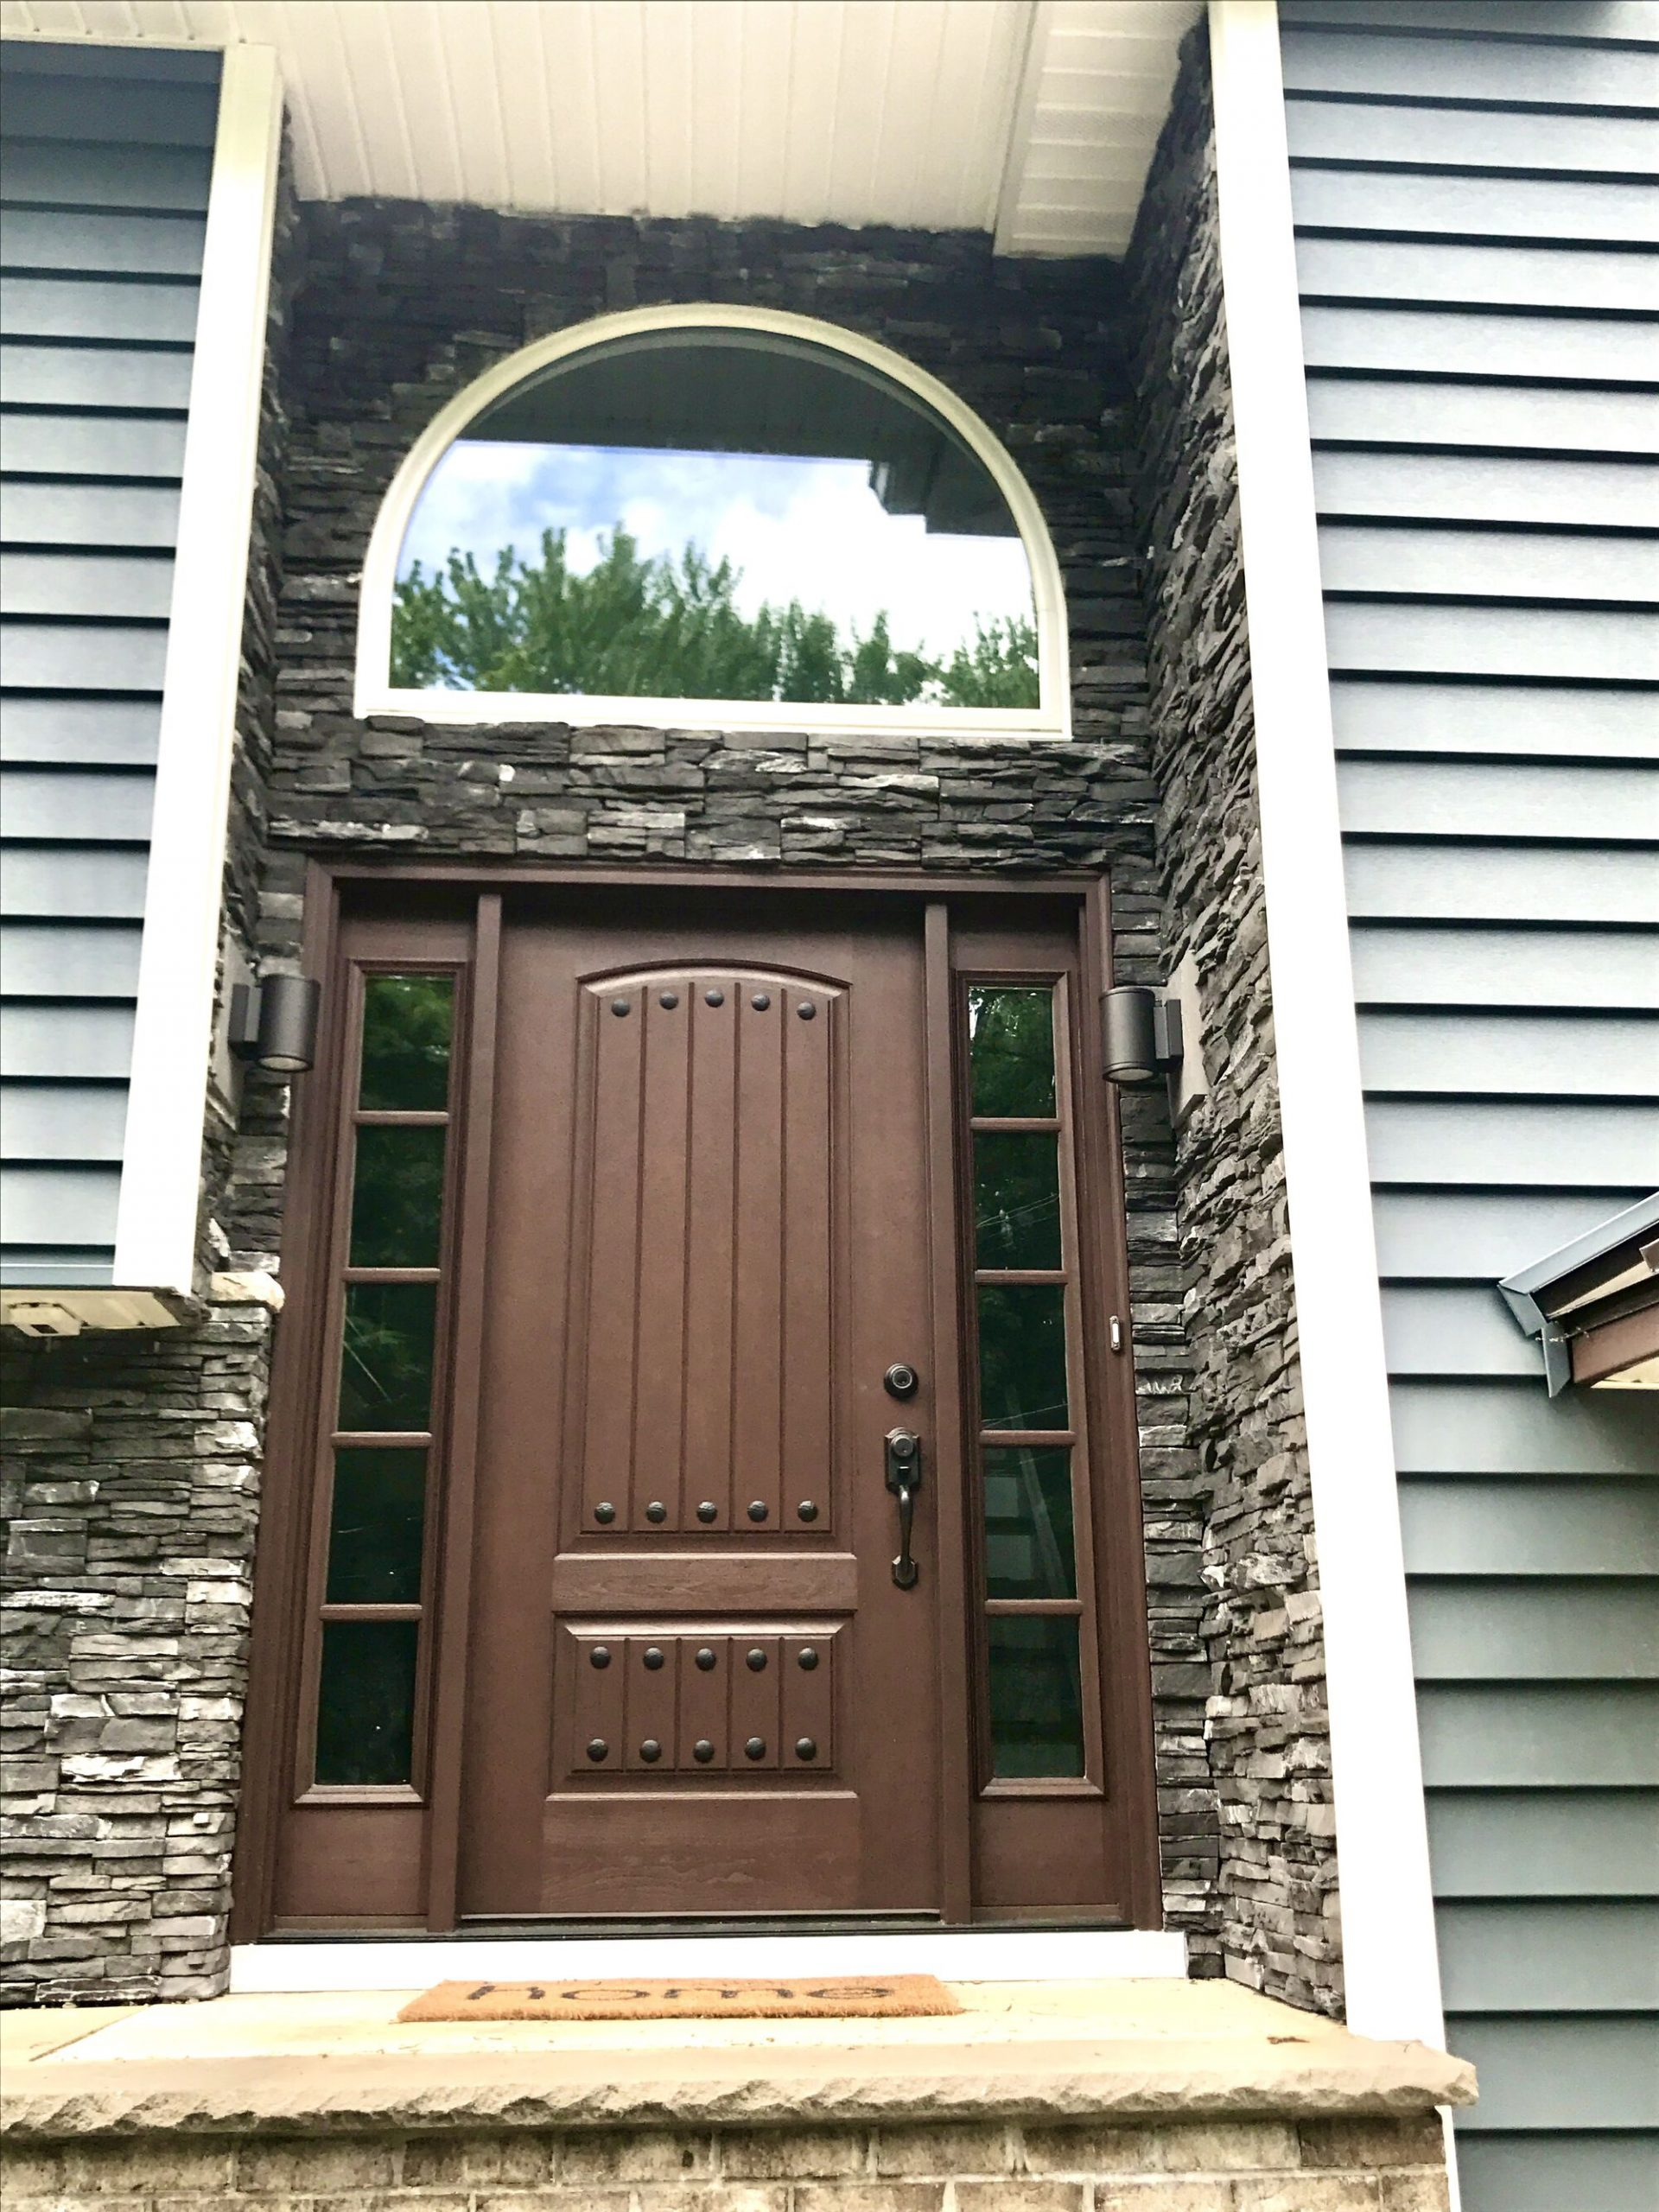 Therma Tru Entry Door, Custom Window, Boral Stone in Morristown, Morris County NJ